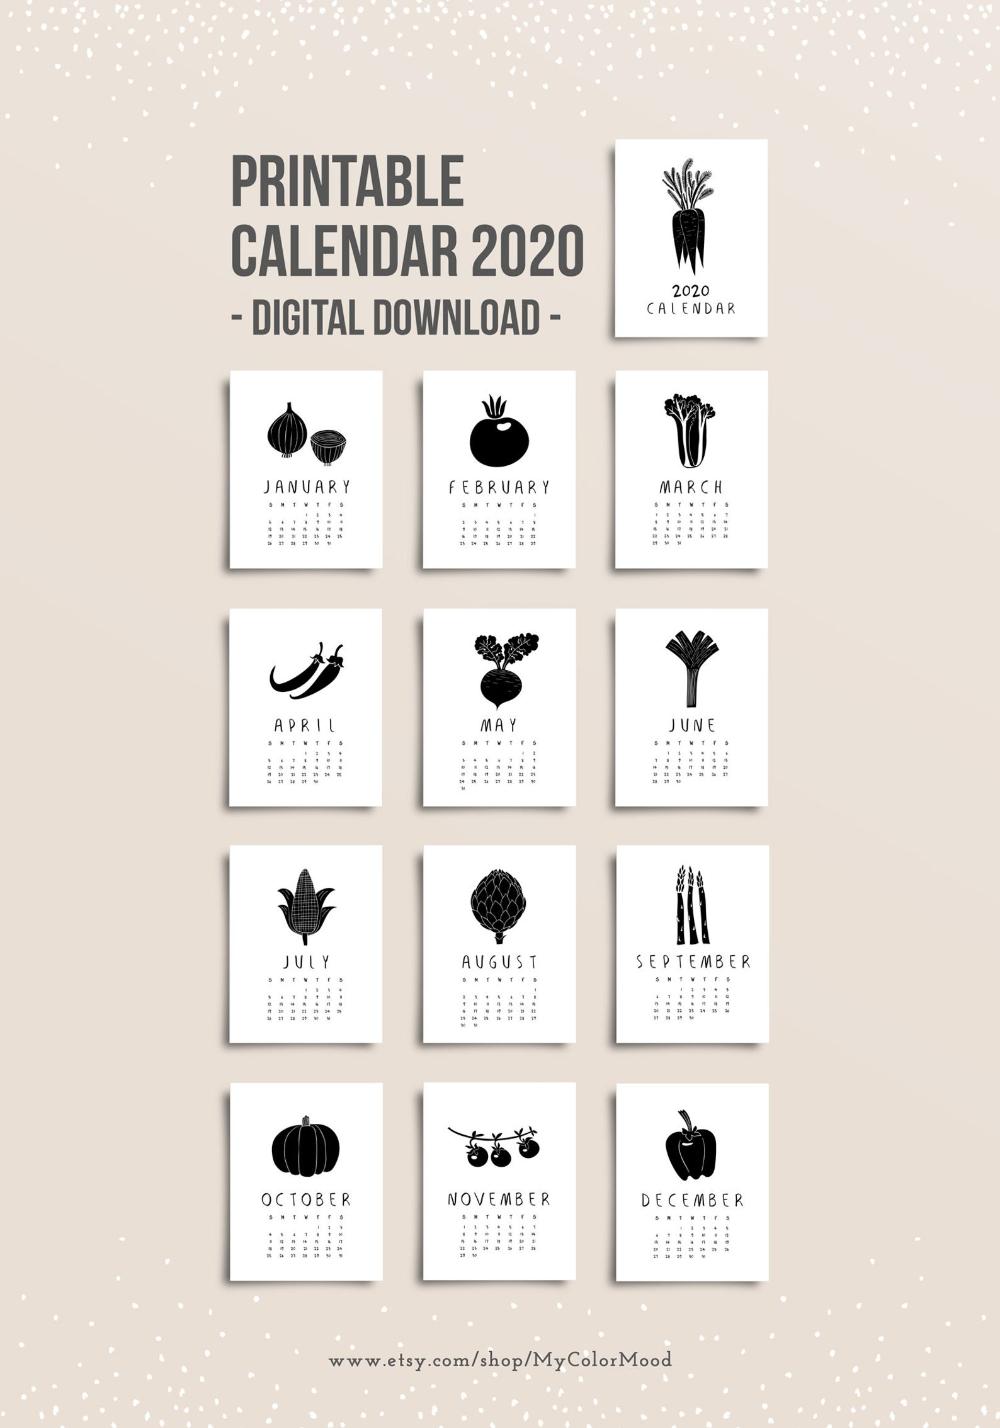 Monthly Calendar 2020 Printable Kitchen Calendar Pages Modern Rustic Wall Calendar Download Vegetable Vegan Food Calendar Foodie Gift Calendar Calendar 2020 Calendar Pages